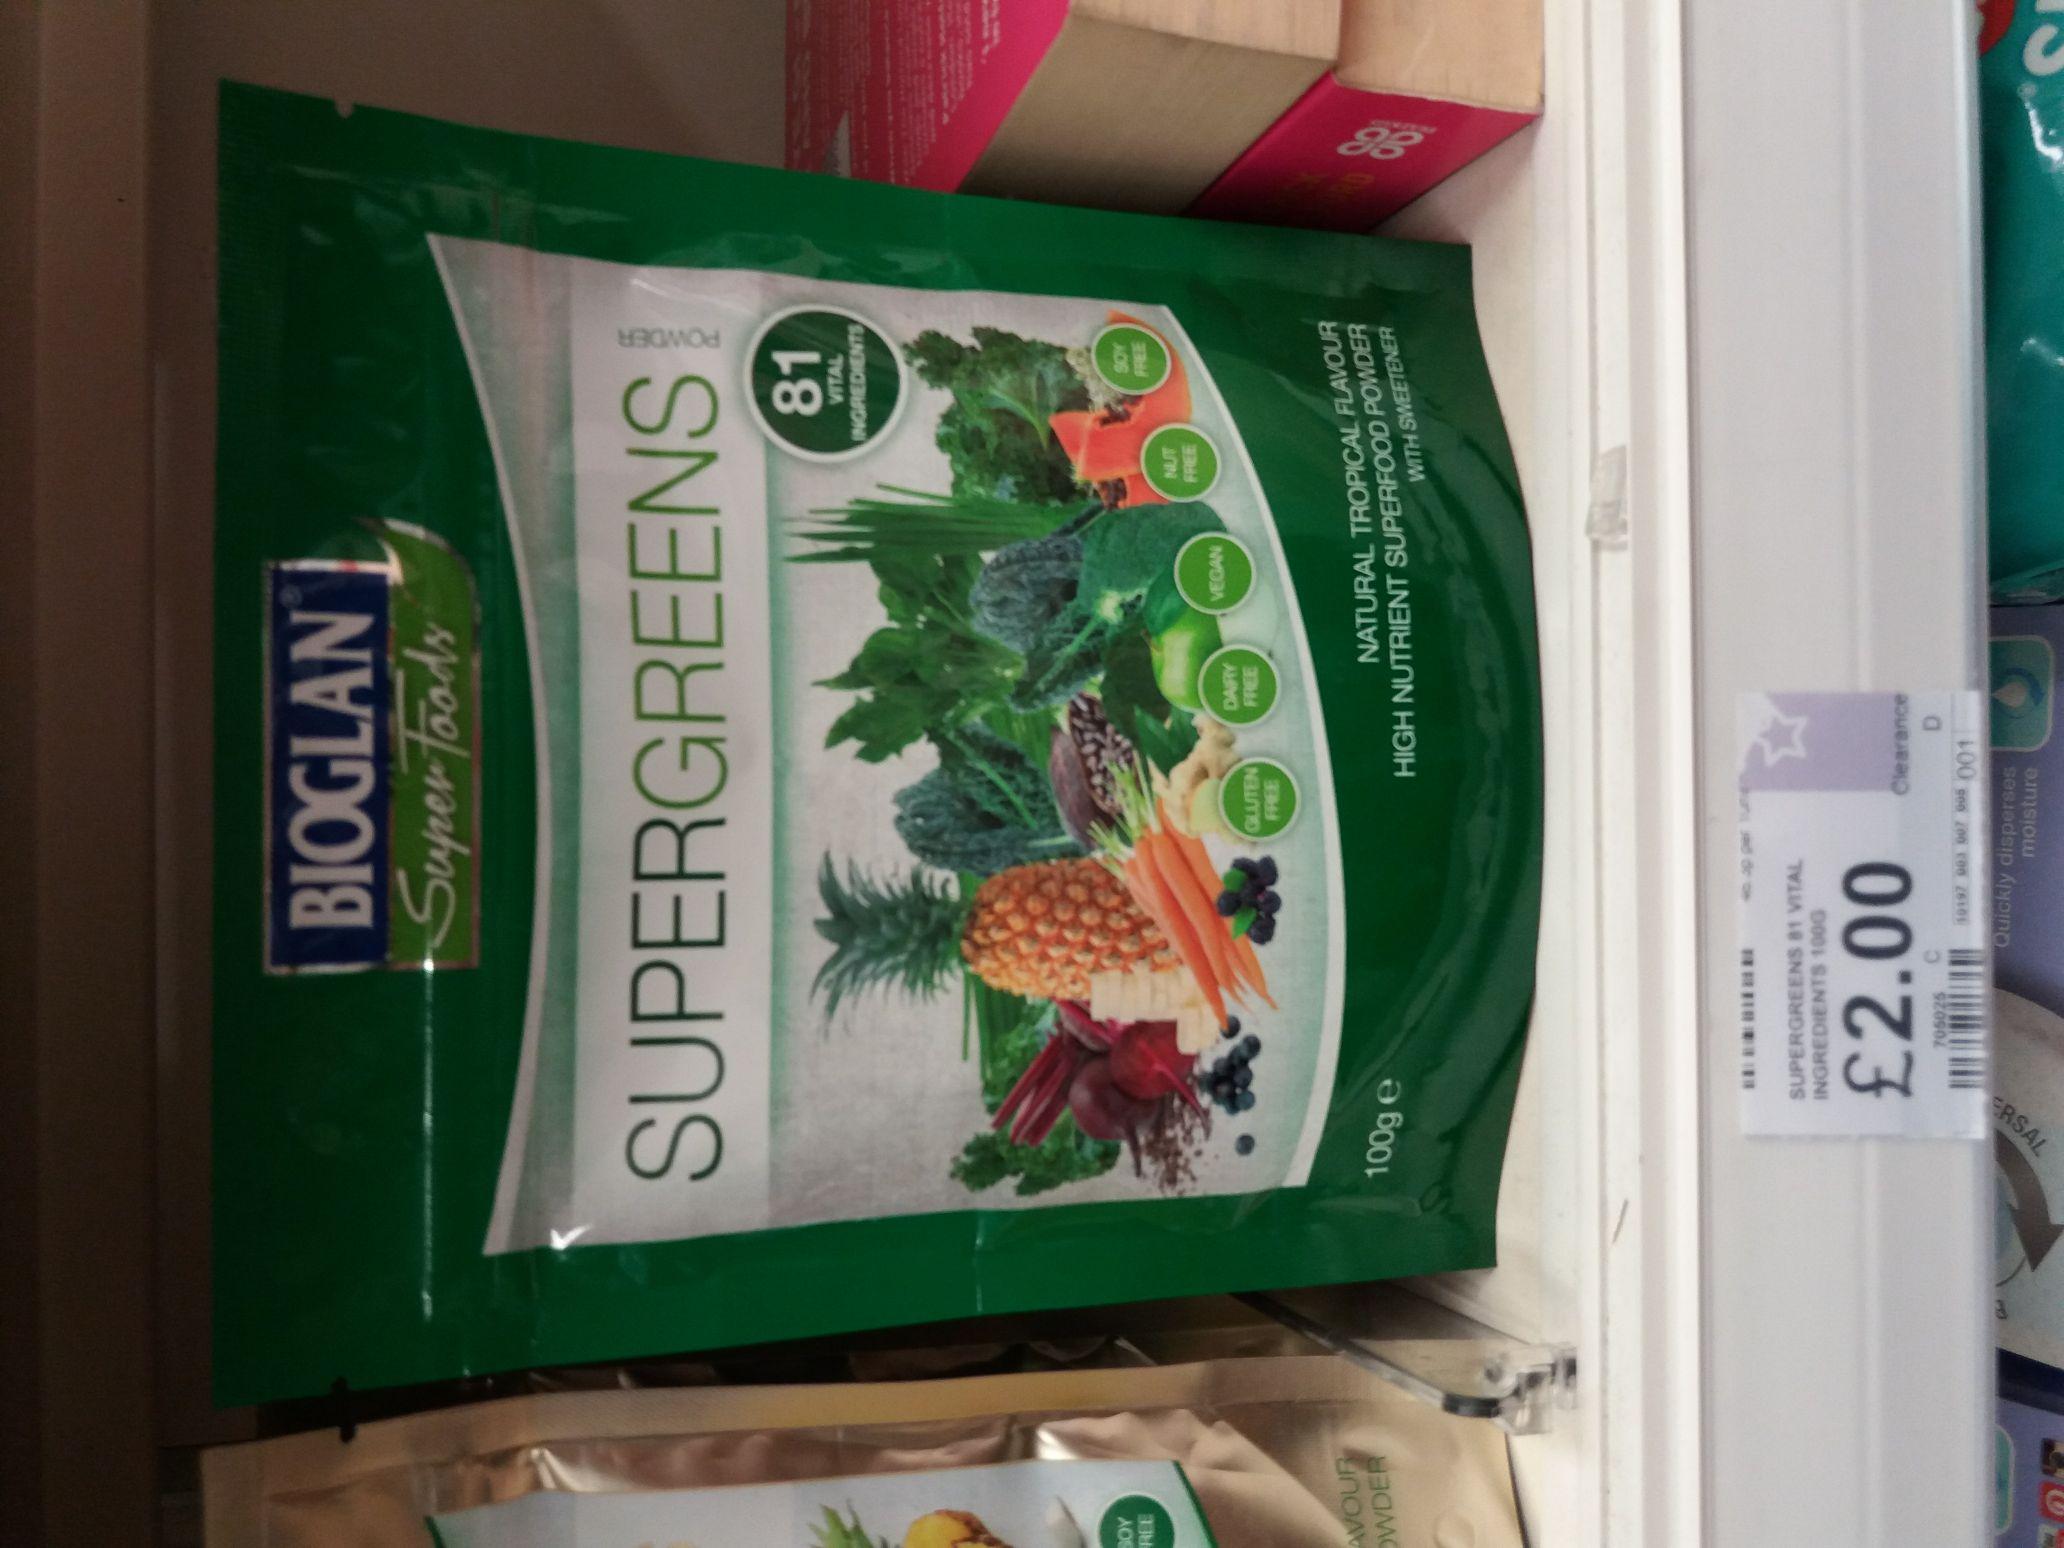 Bioglan Supergreens powder tropical flavour 100g - £2 instore @ Superdrug (Chatham)